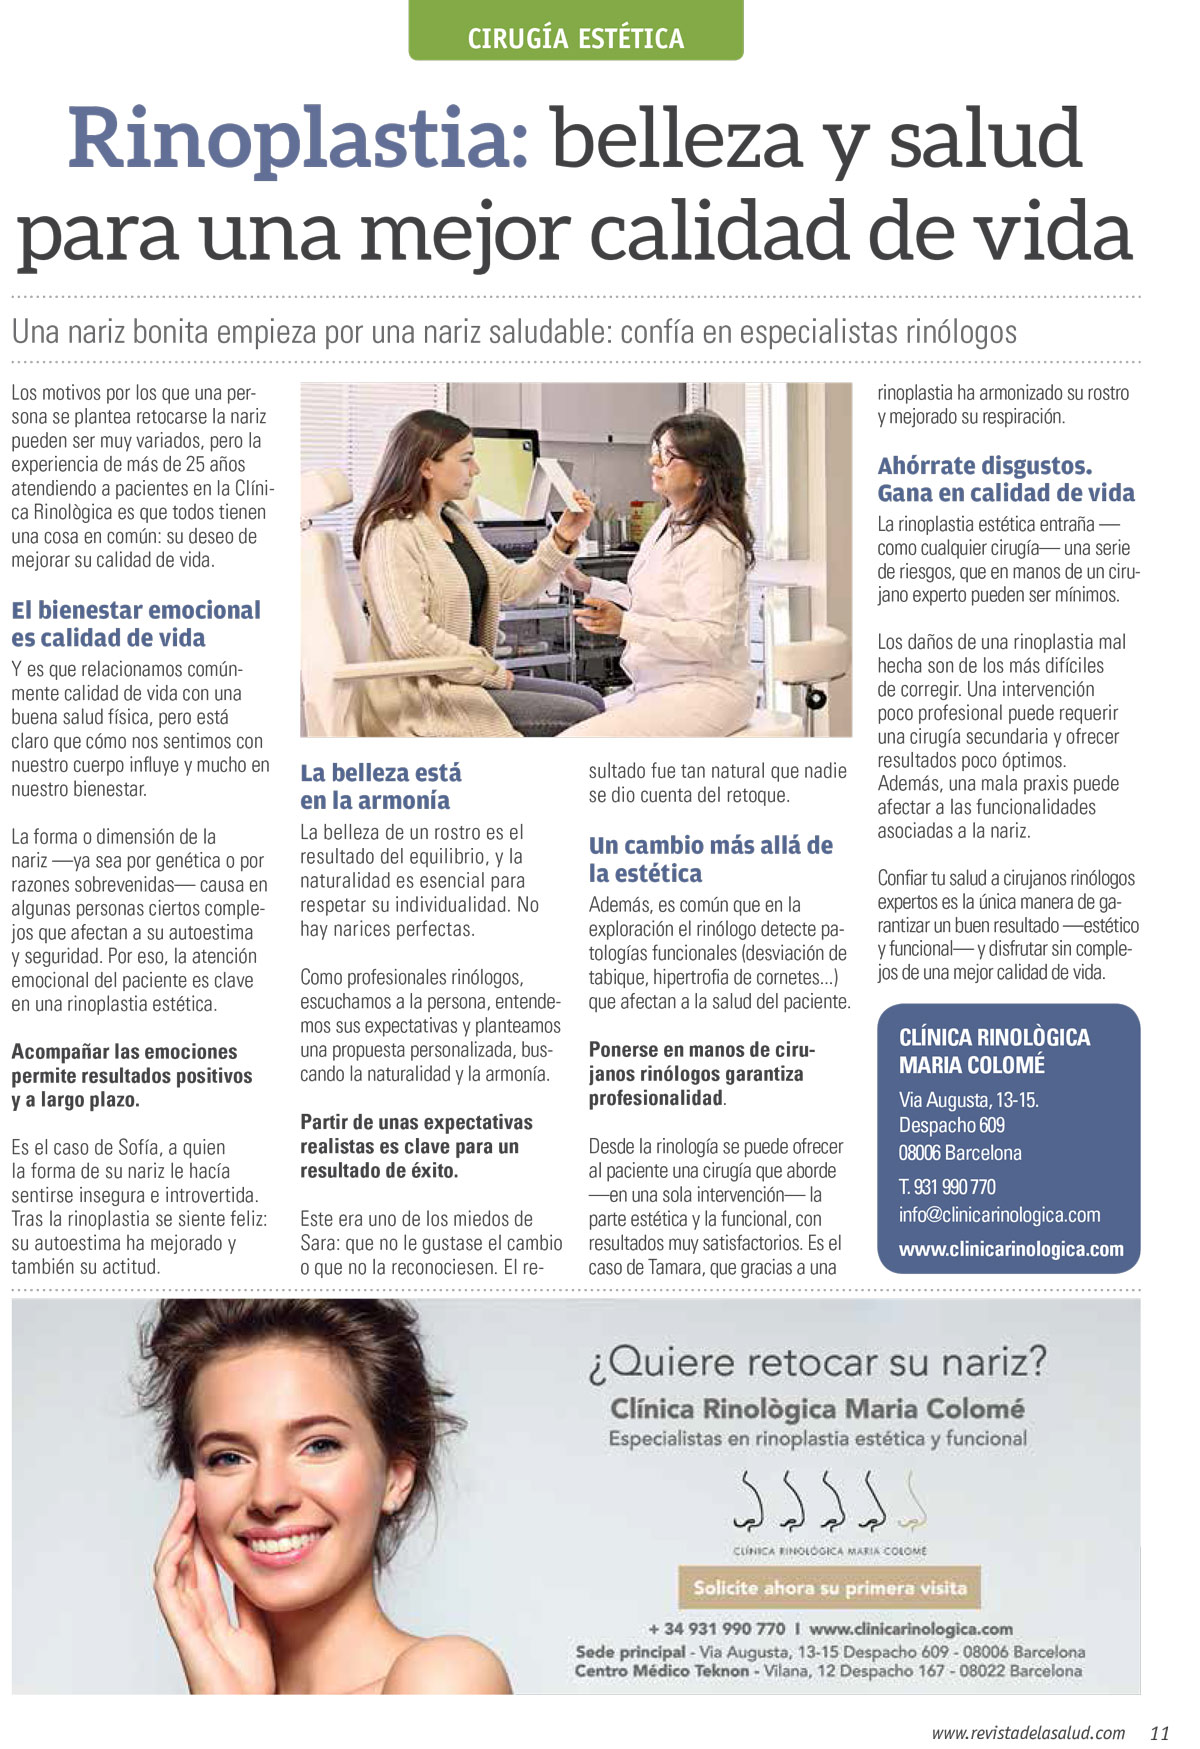 Clínica Rinològica Maria Colomé - Notícies 8